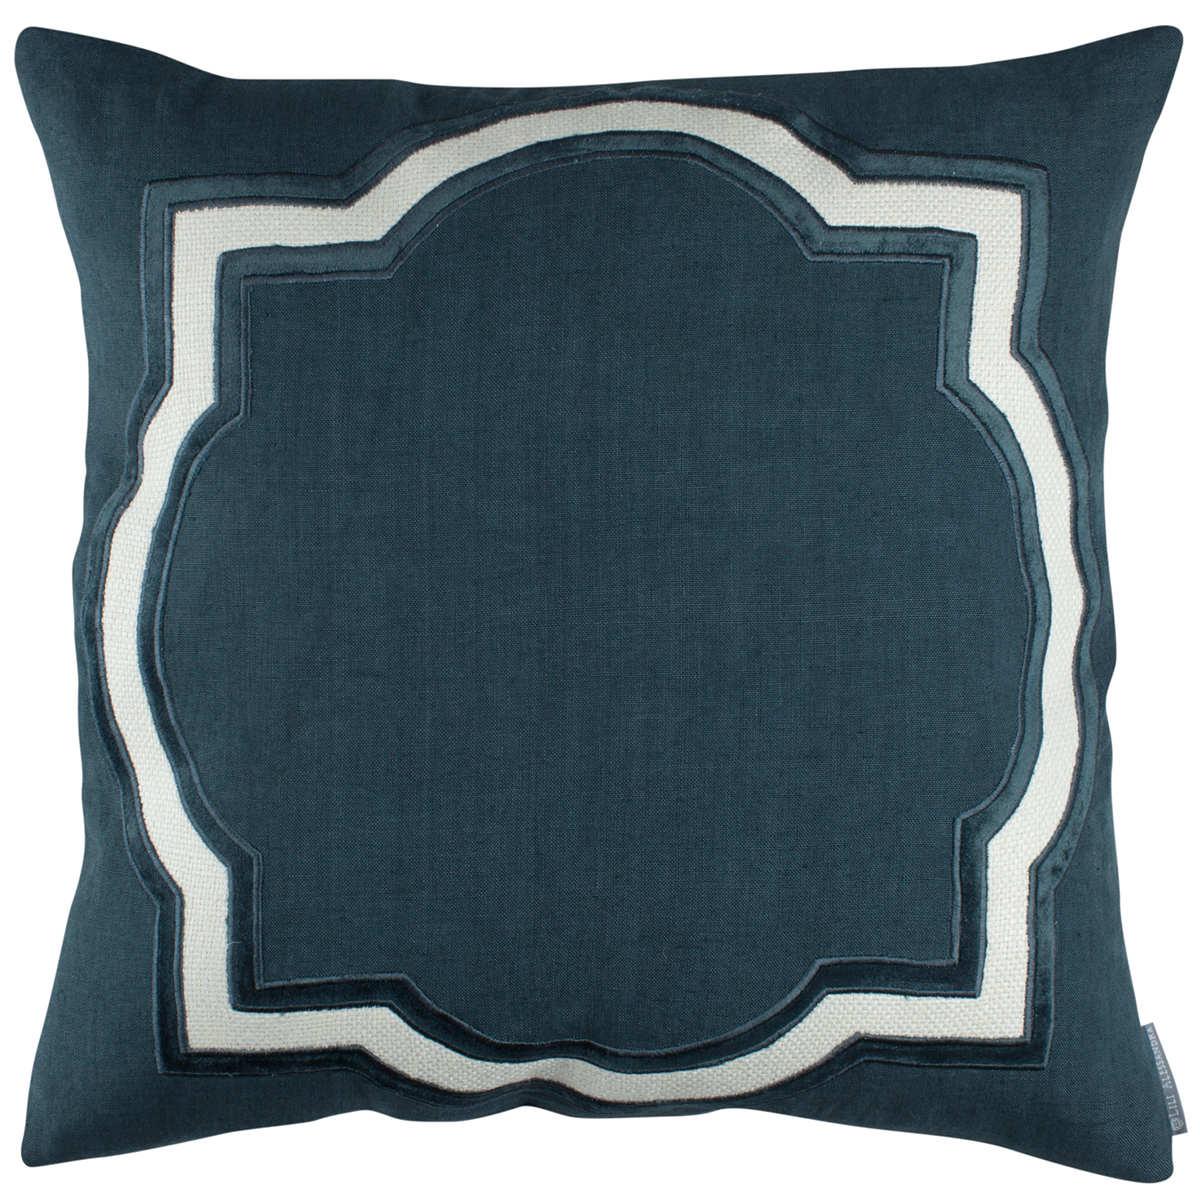 Lili Alessandra Barcelona Midnight Blue Pillows